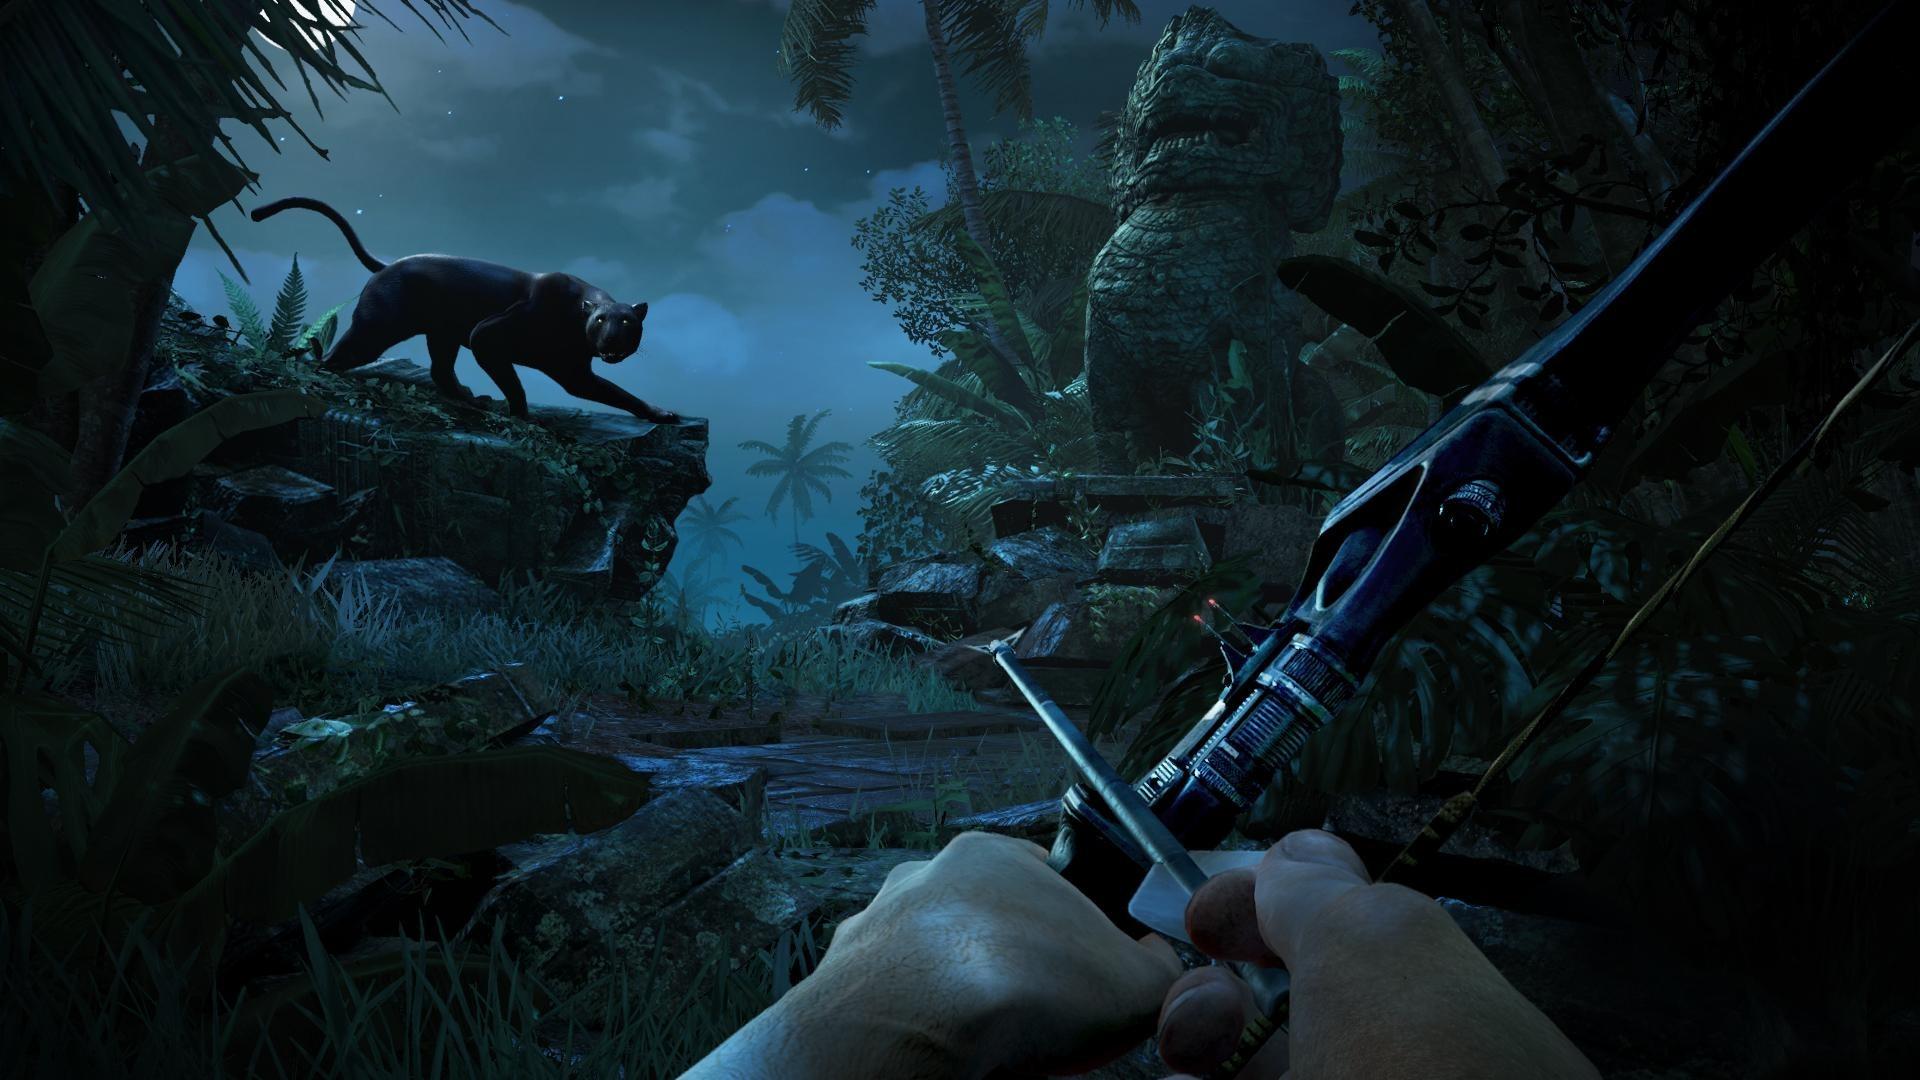 2012 Far Cry 3 Game Hd Wallpaper 52 Avance 10wallpapercom